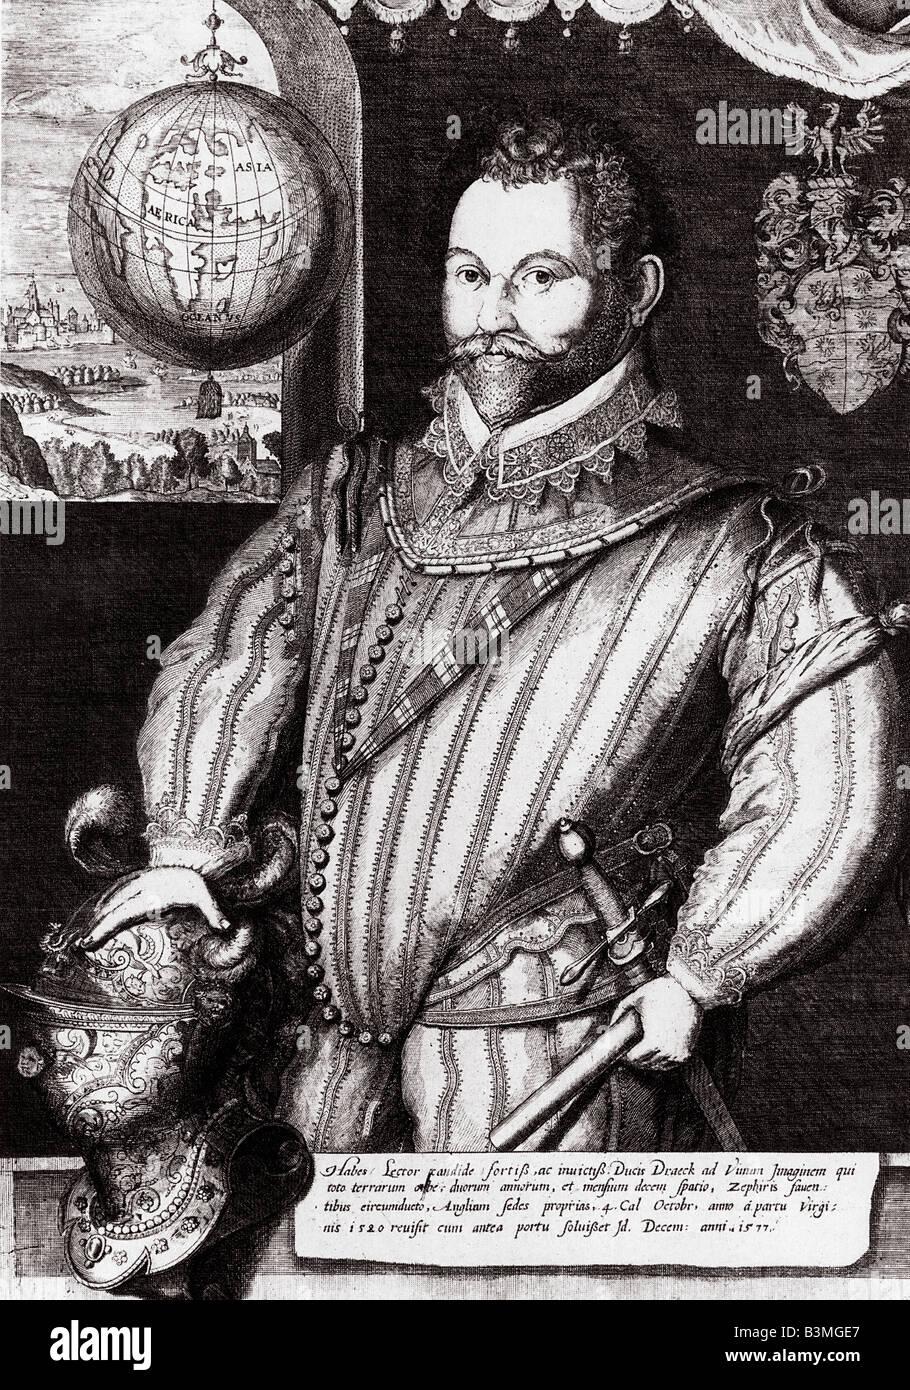 SIR FRANCIS DRAKE English navigator c 1540 to 1596 - Stock Image